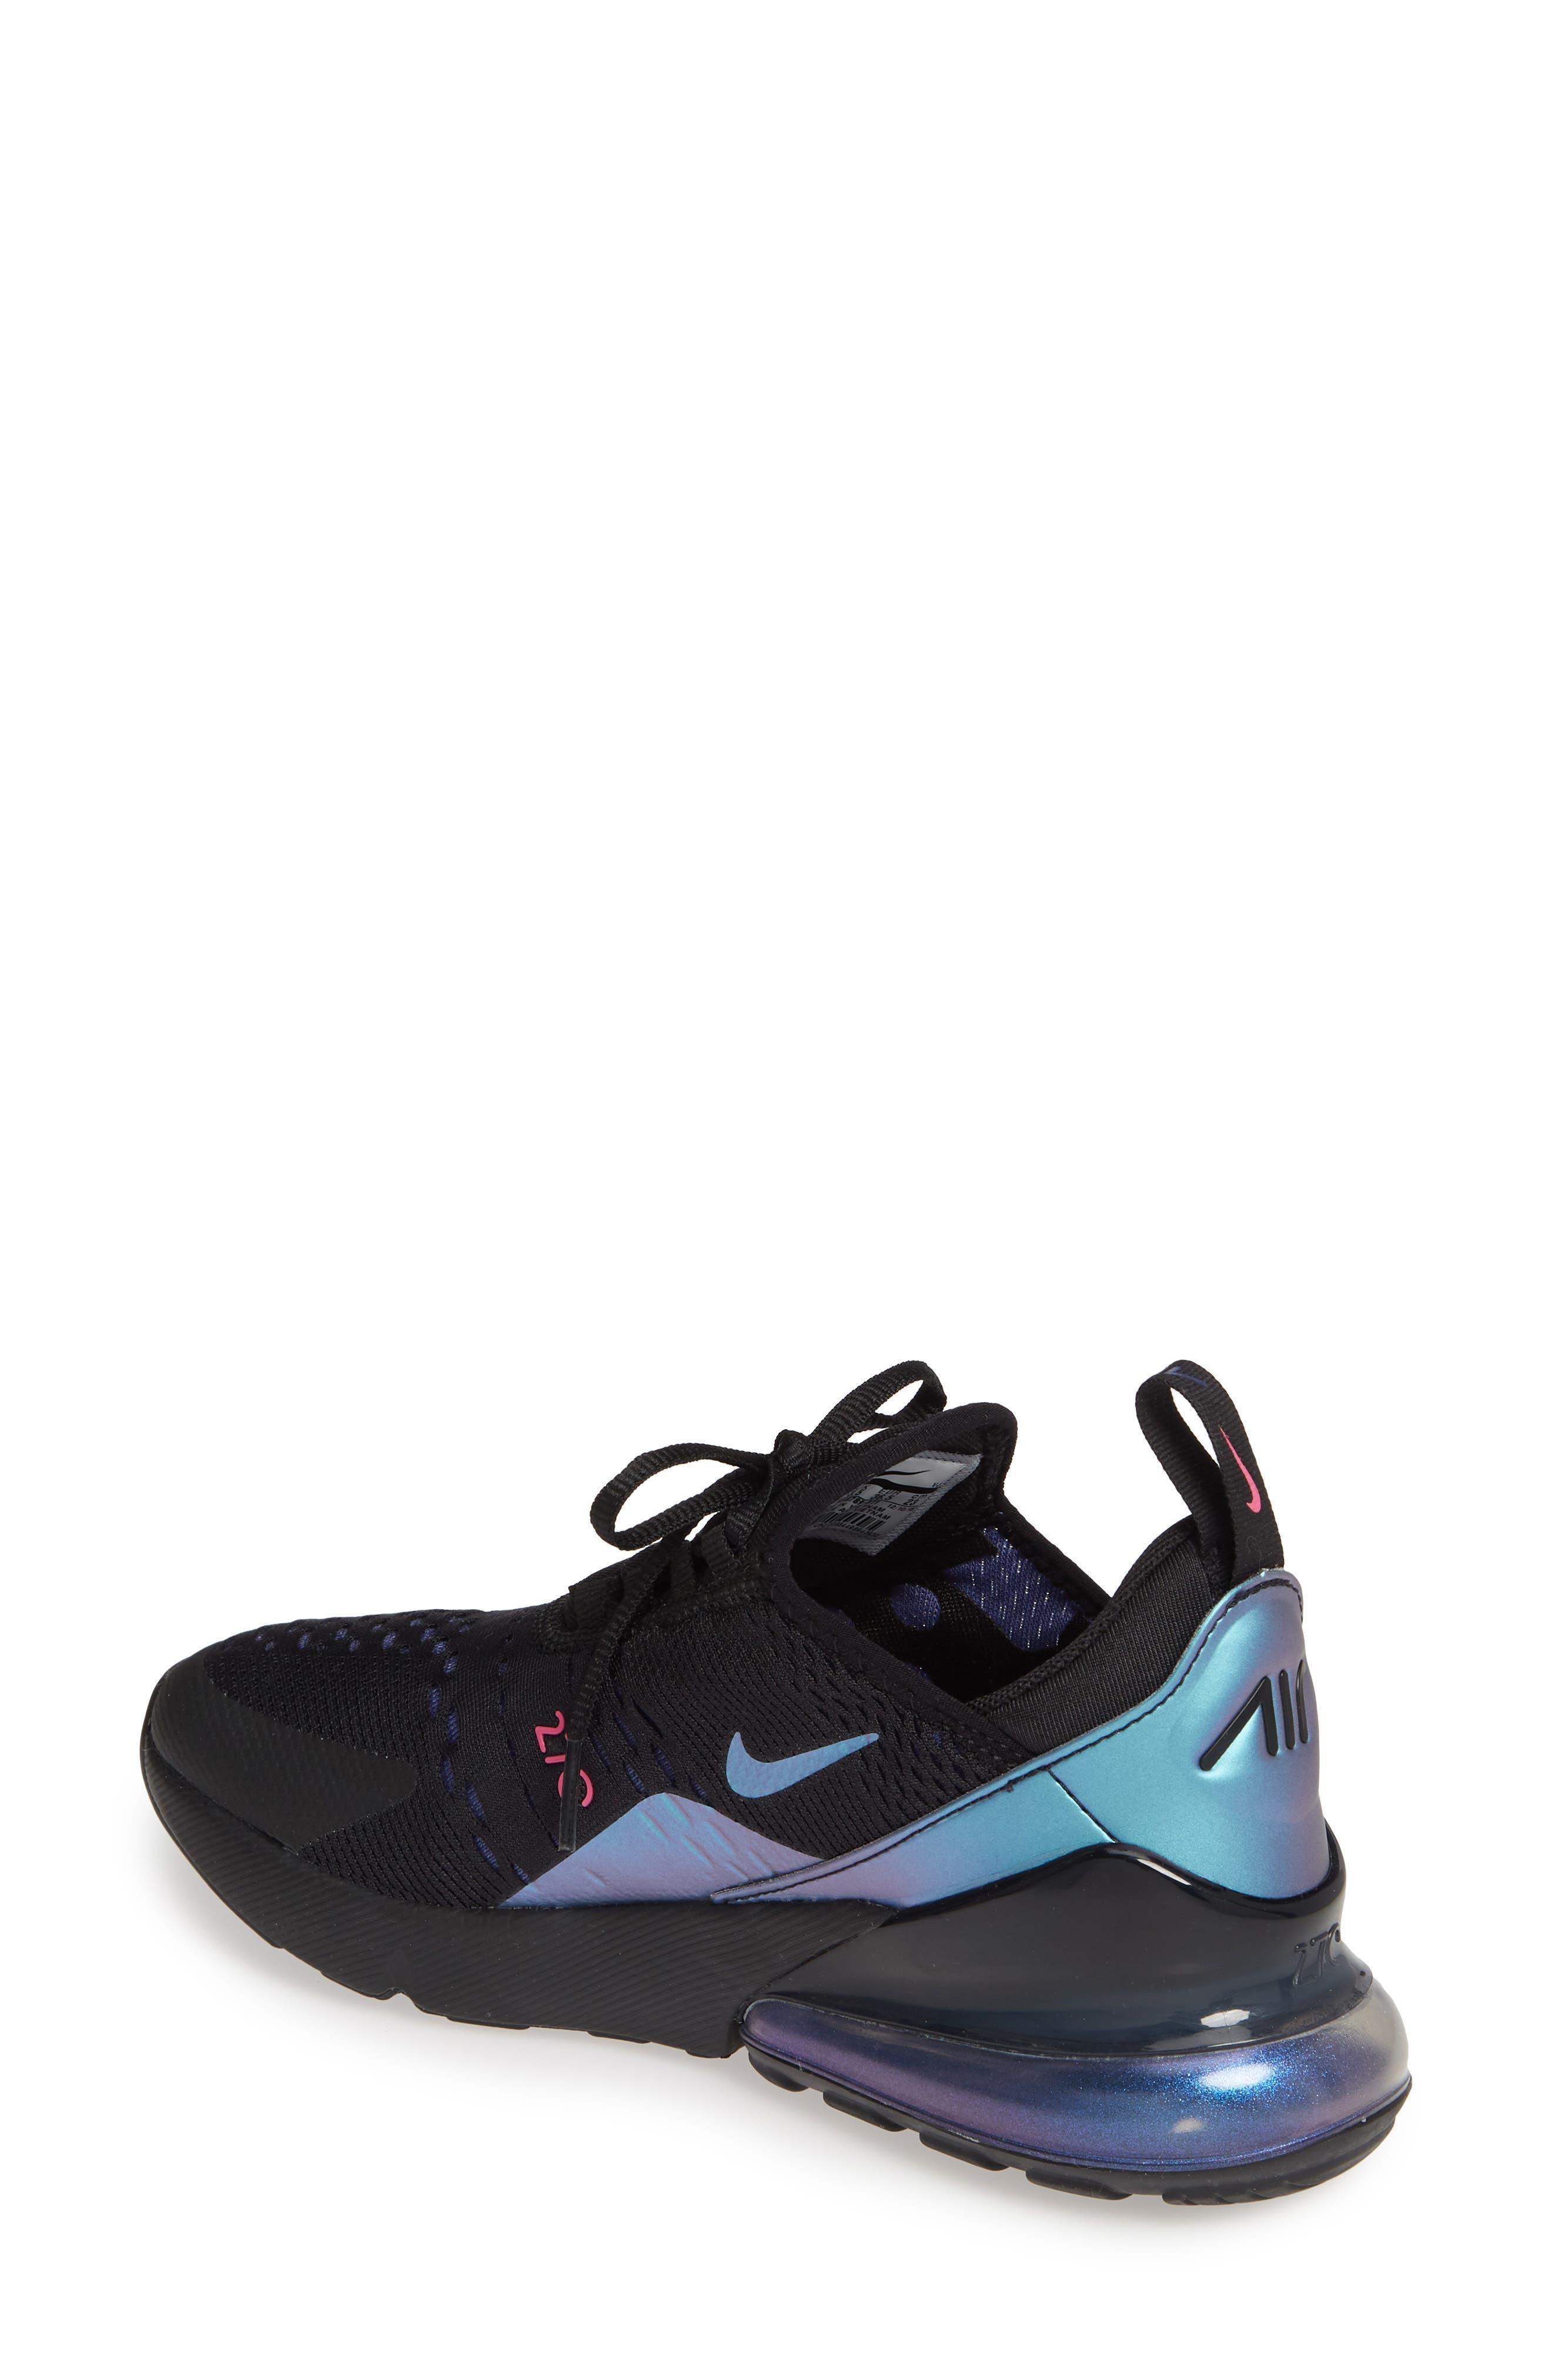 NIKE,                             Air Max 270 Premium Sneaker,                             Alternate thumbnail 2, color,                             BLACK/ FUCHSIA/ PURPLE